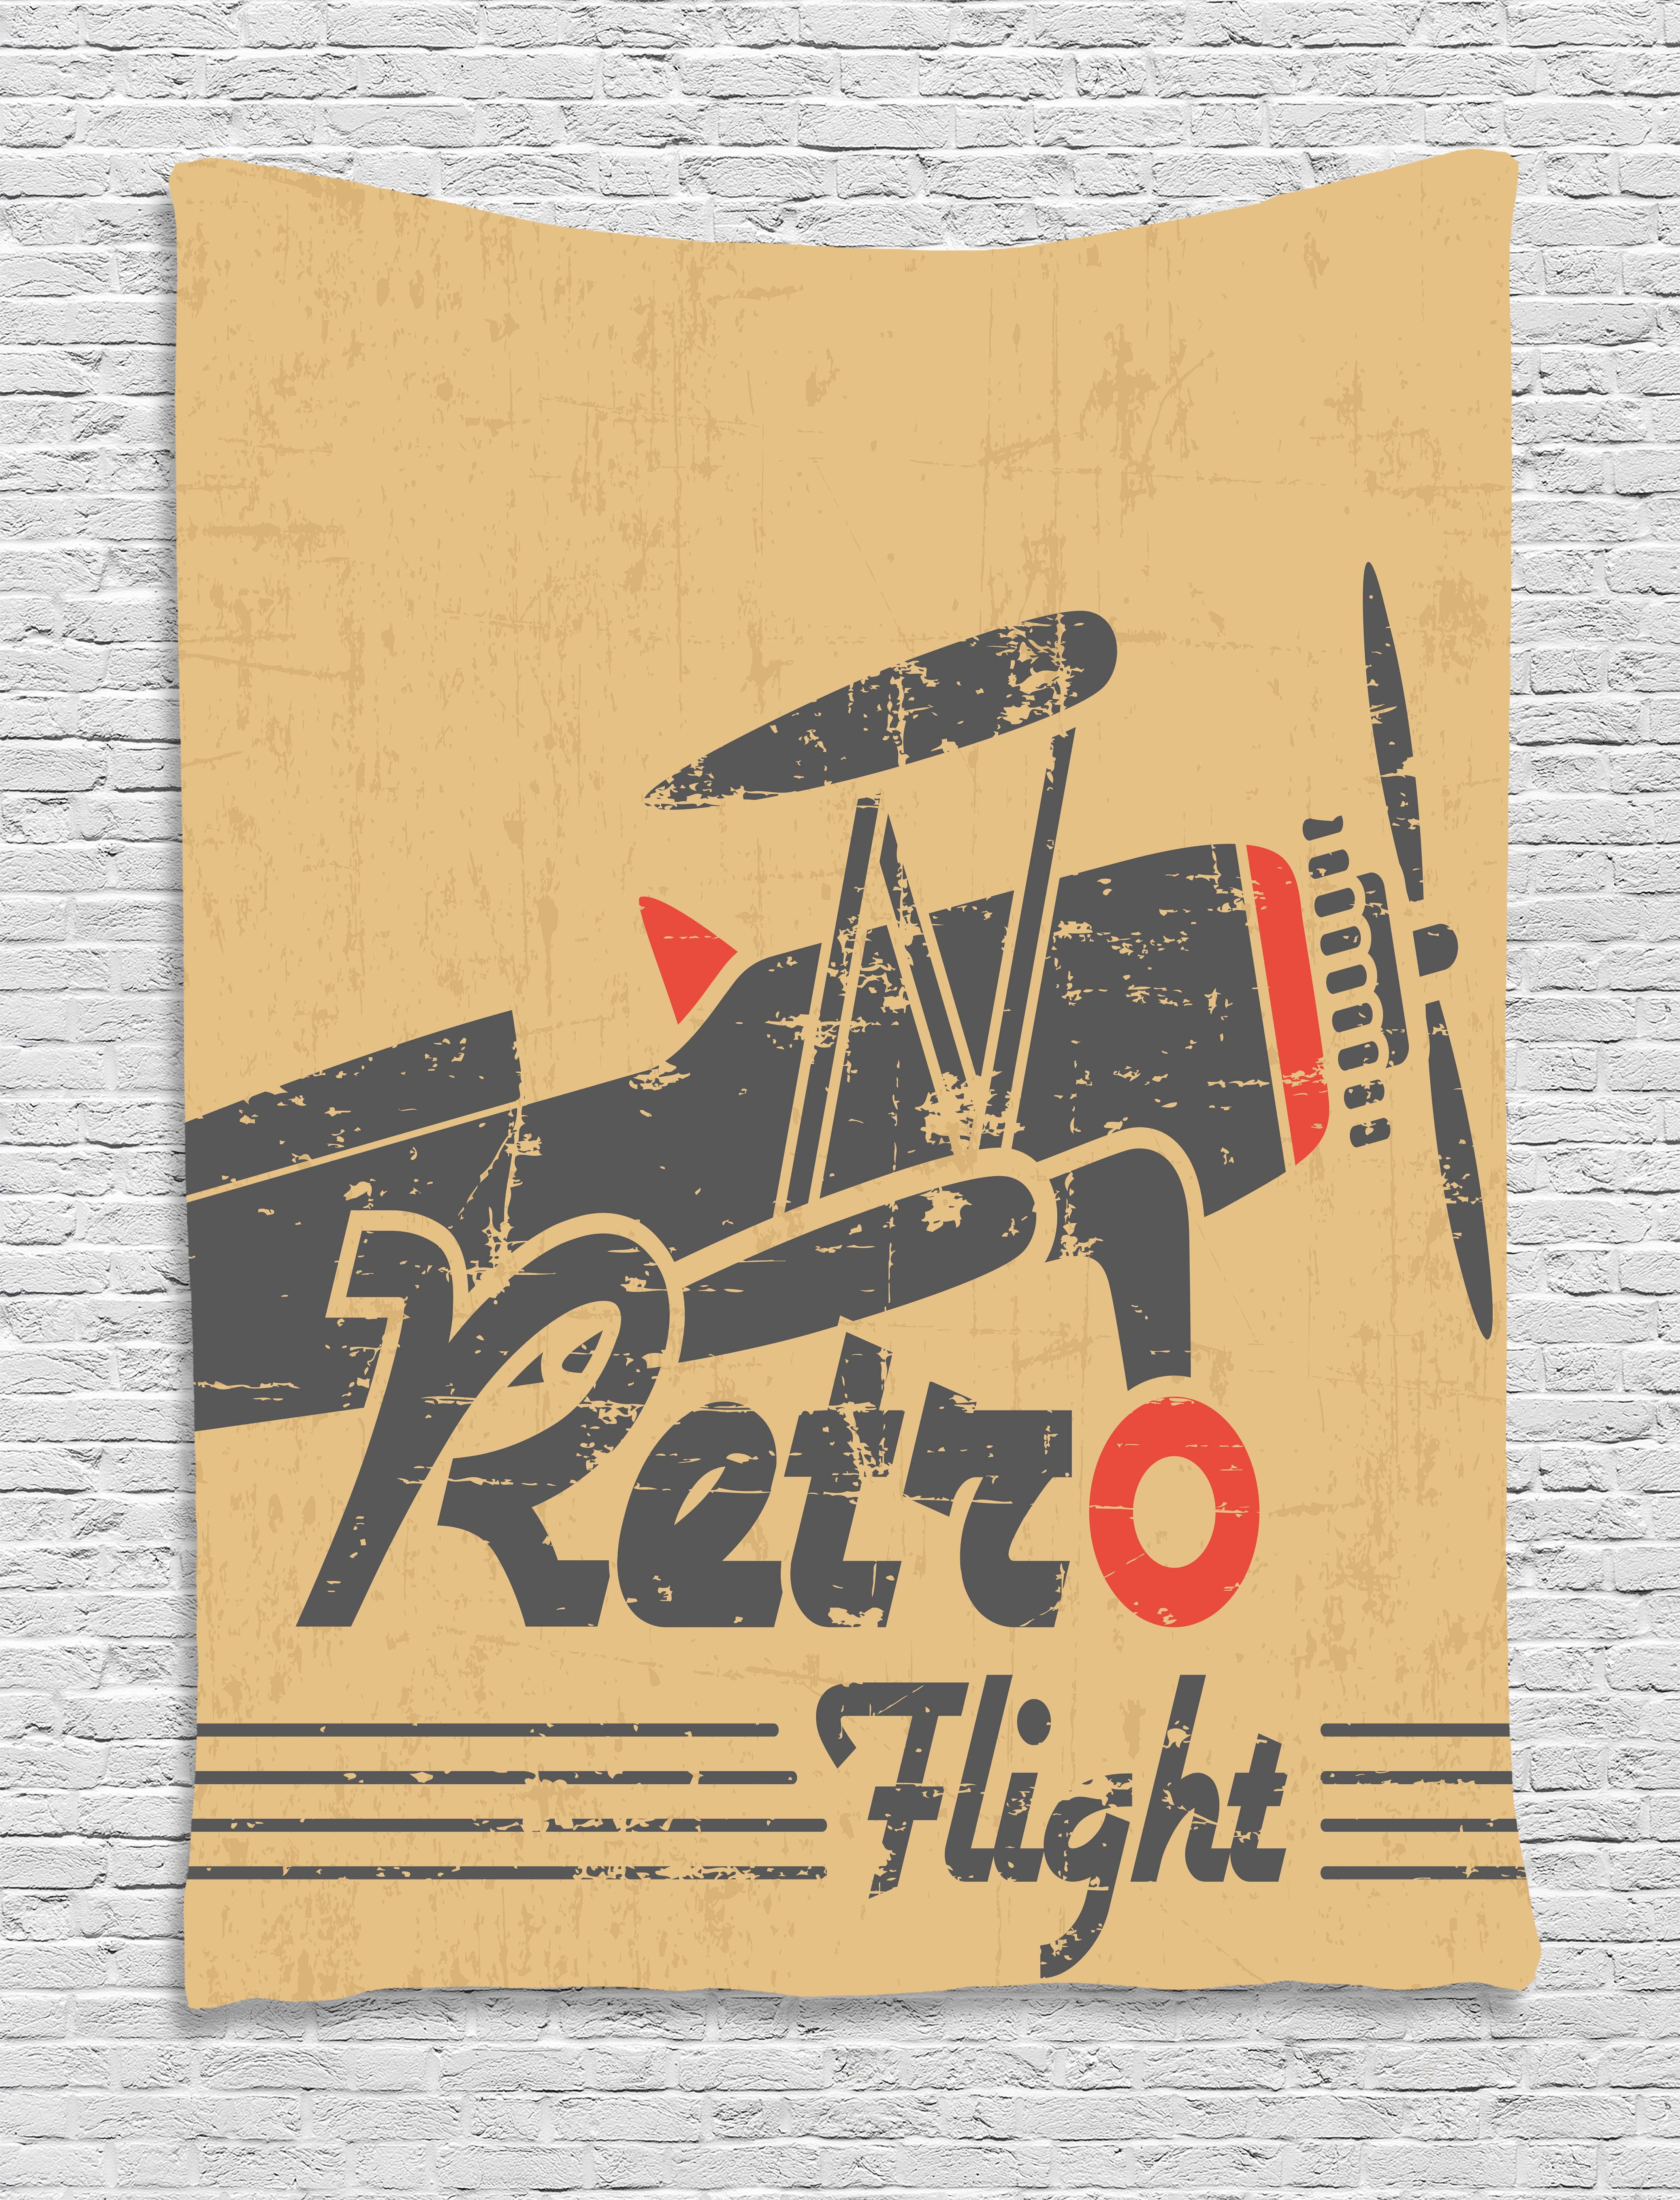 Vintage Airplane Decor Tapestry, Retro Flight Emblem with Old Plane ...